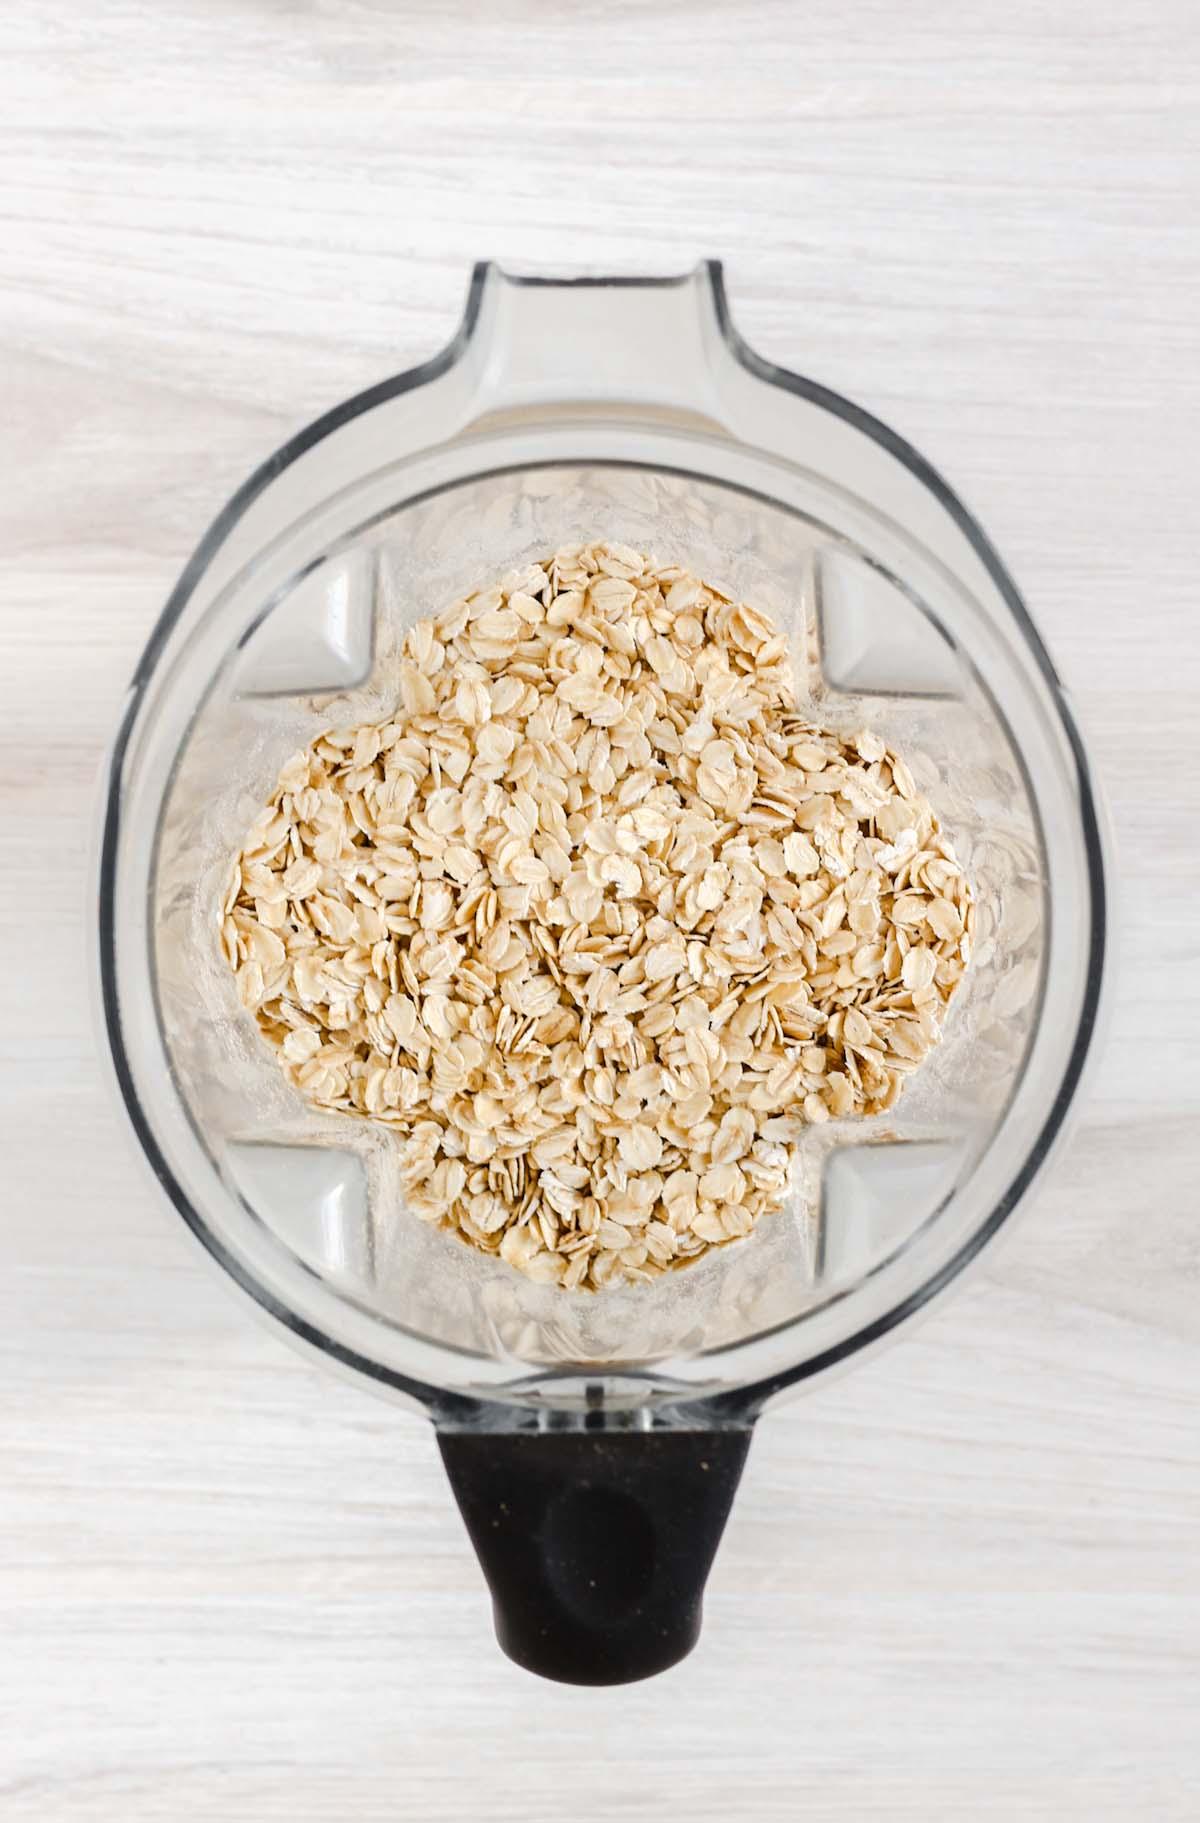 rolled oats in a blender